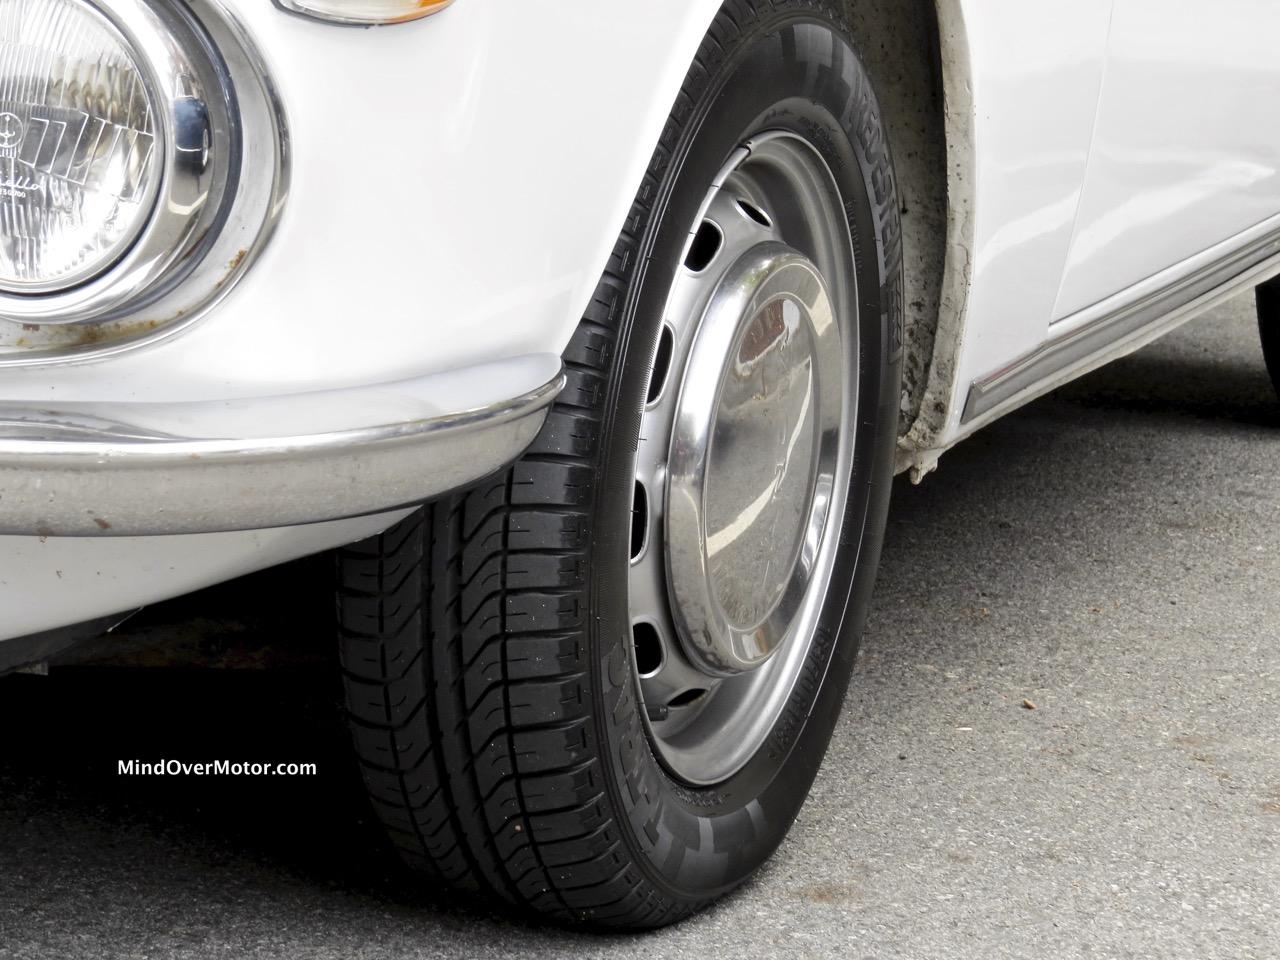 1968 Lancia Fulvia Front Tire